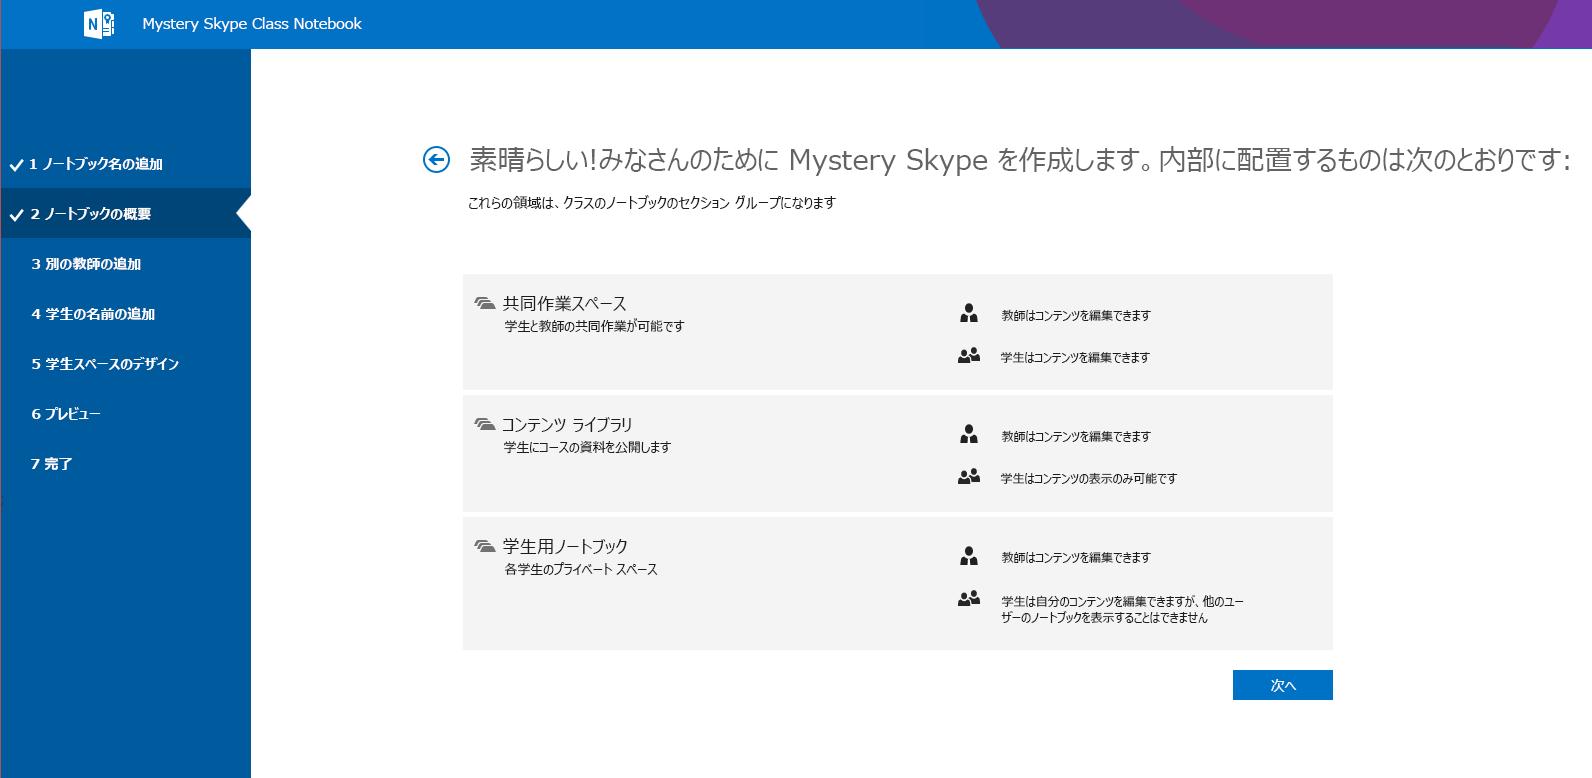 Mystery Skype の概要